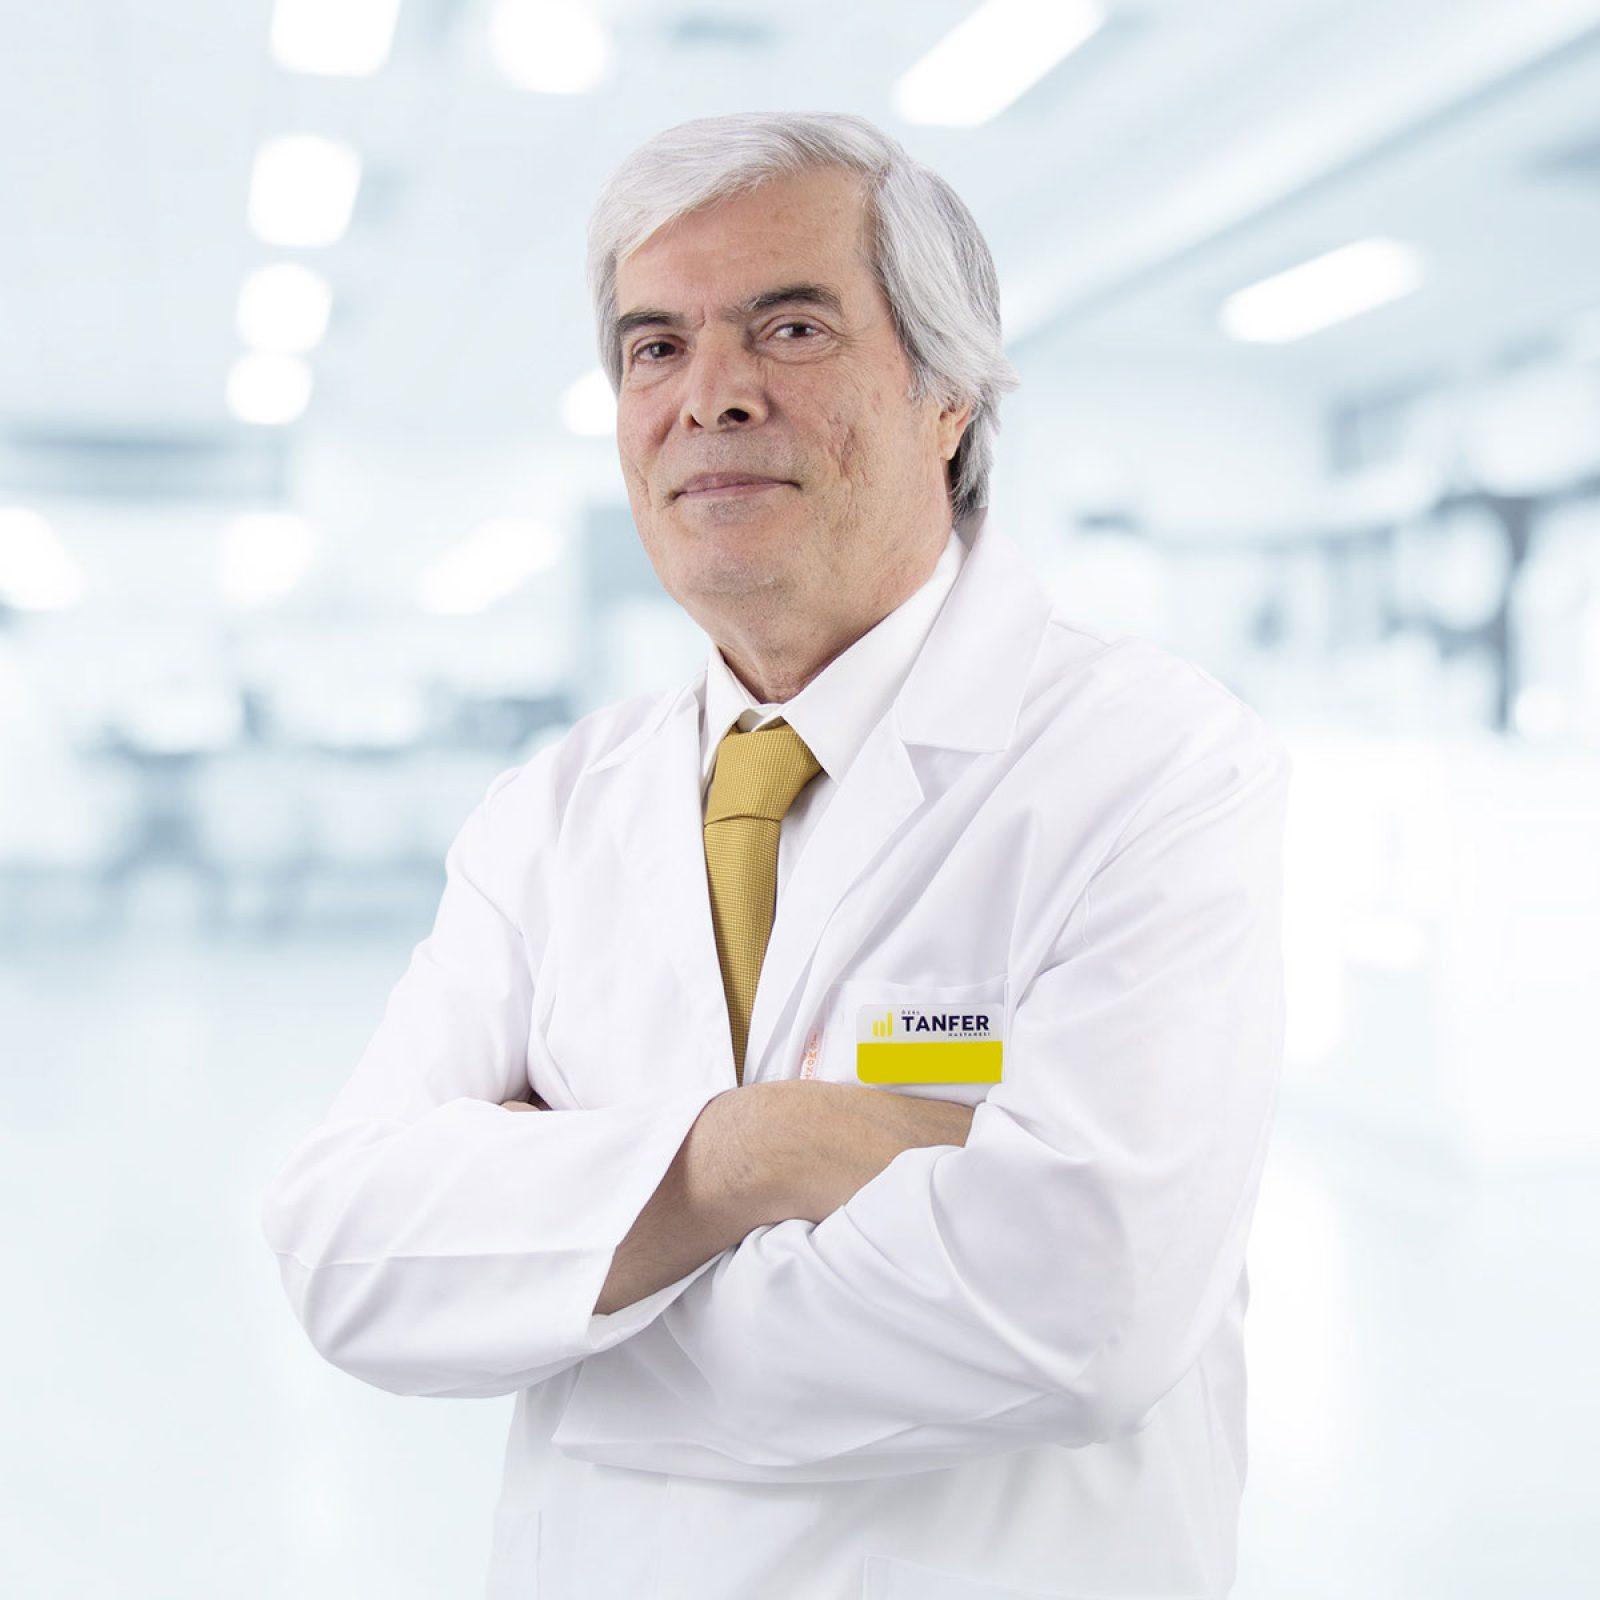 prof-dr-kadir-tahta-profil